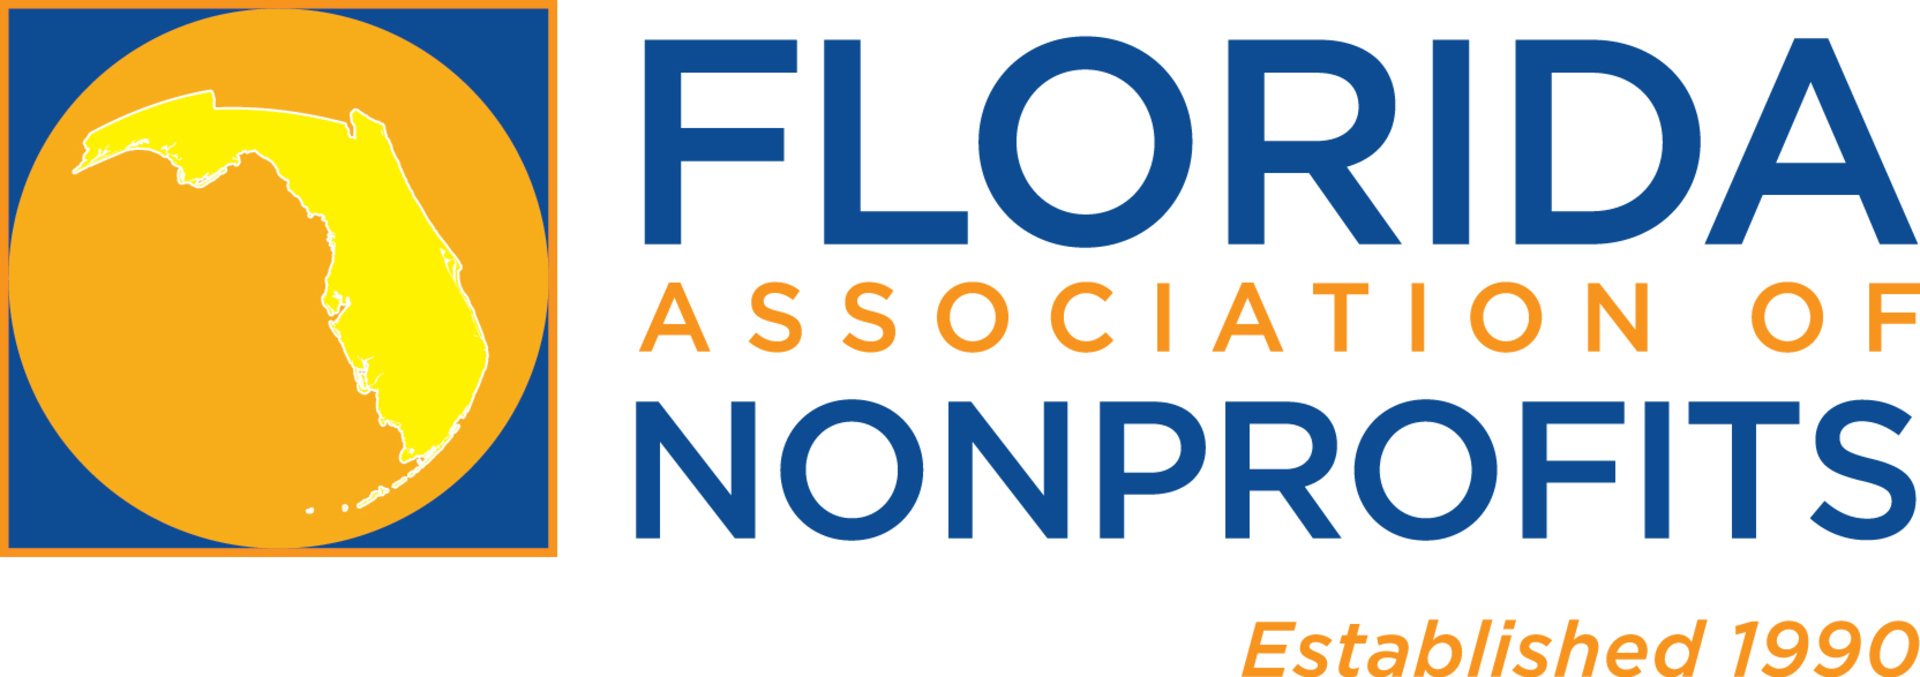 Florida Nonprofits Meet & Greet Networking